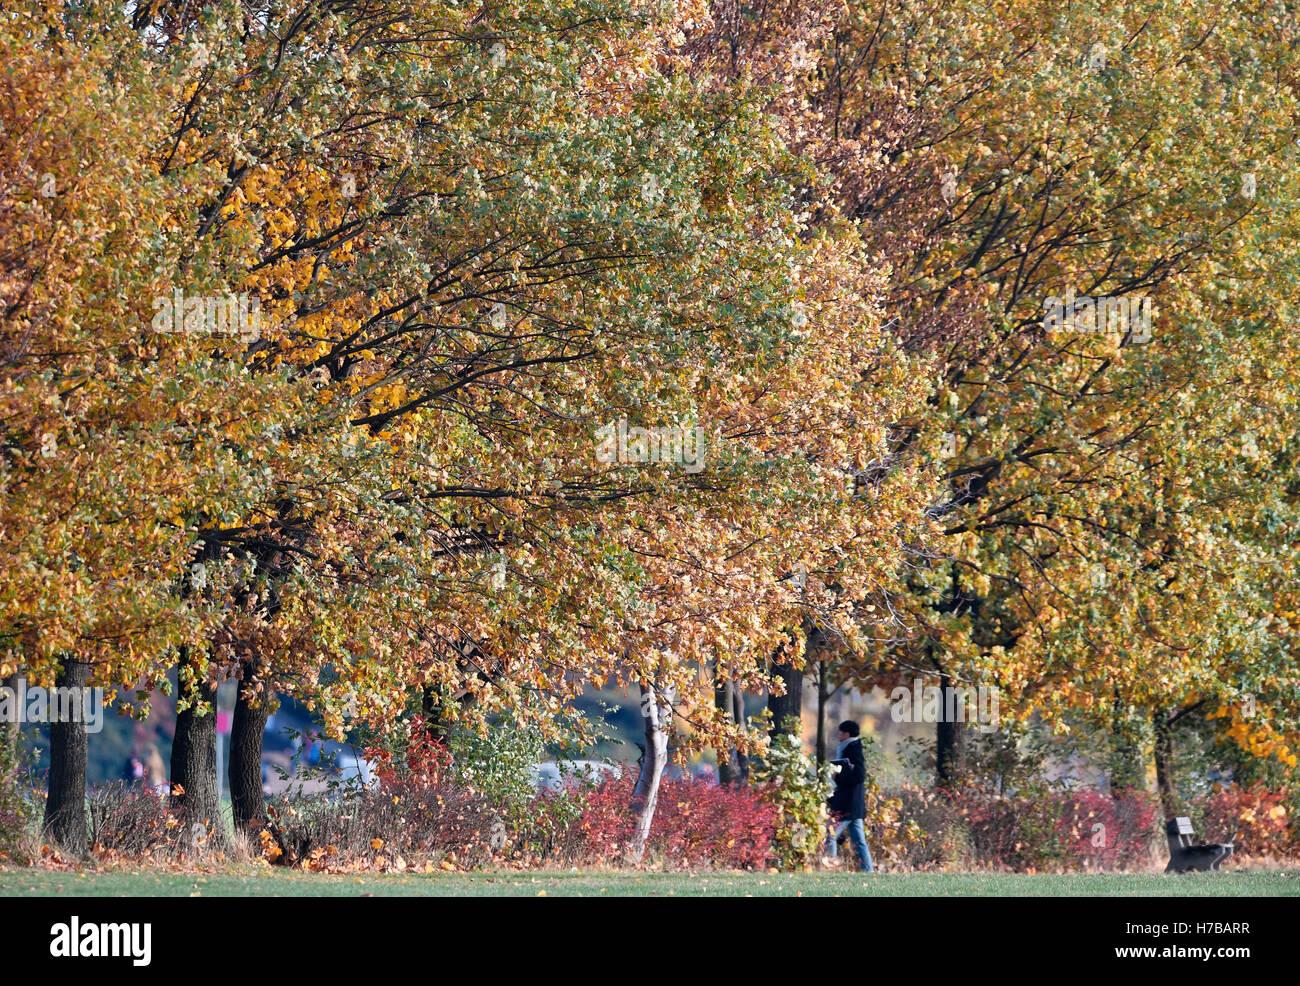 Berlin, Germany. 3rd Nov, 2016. A woman walks between autumnal-coloured trees at Tempelhofer Feld in Berlin, Germany, - Stock Image